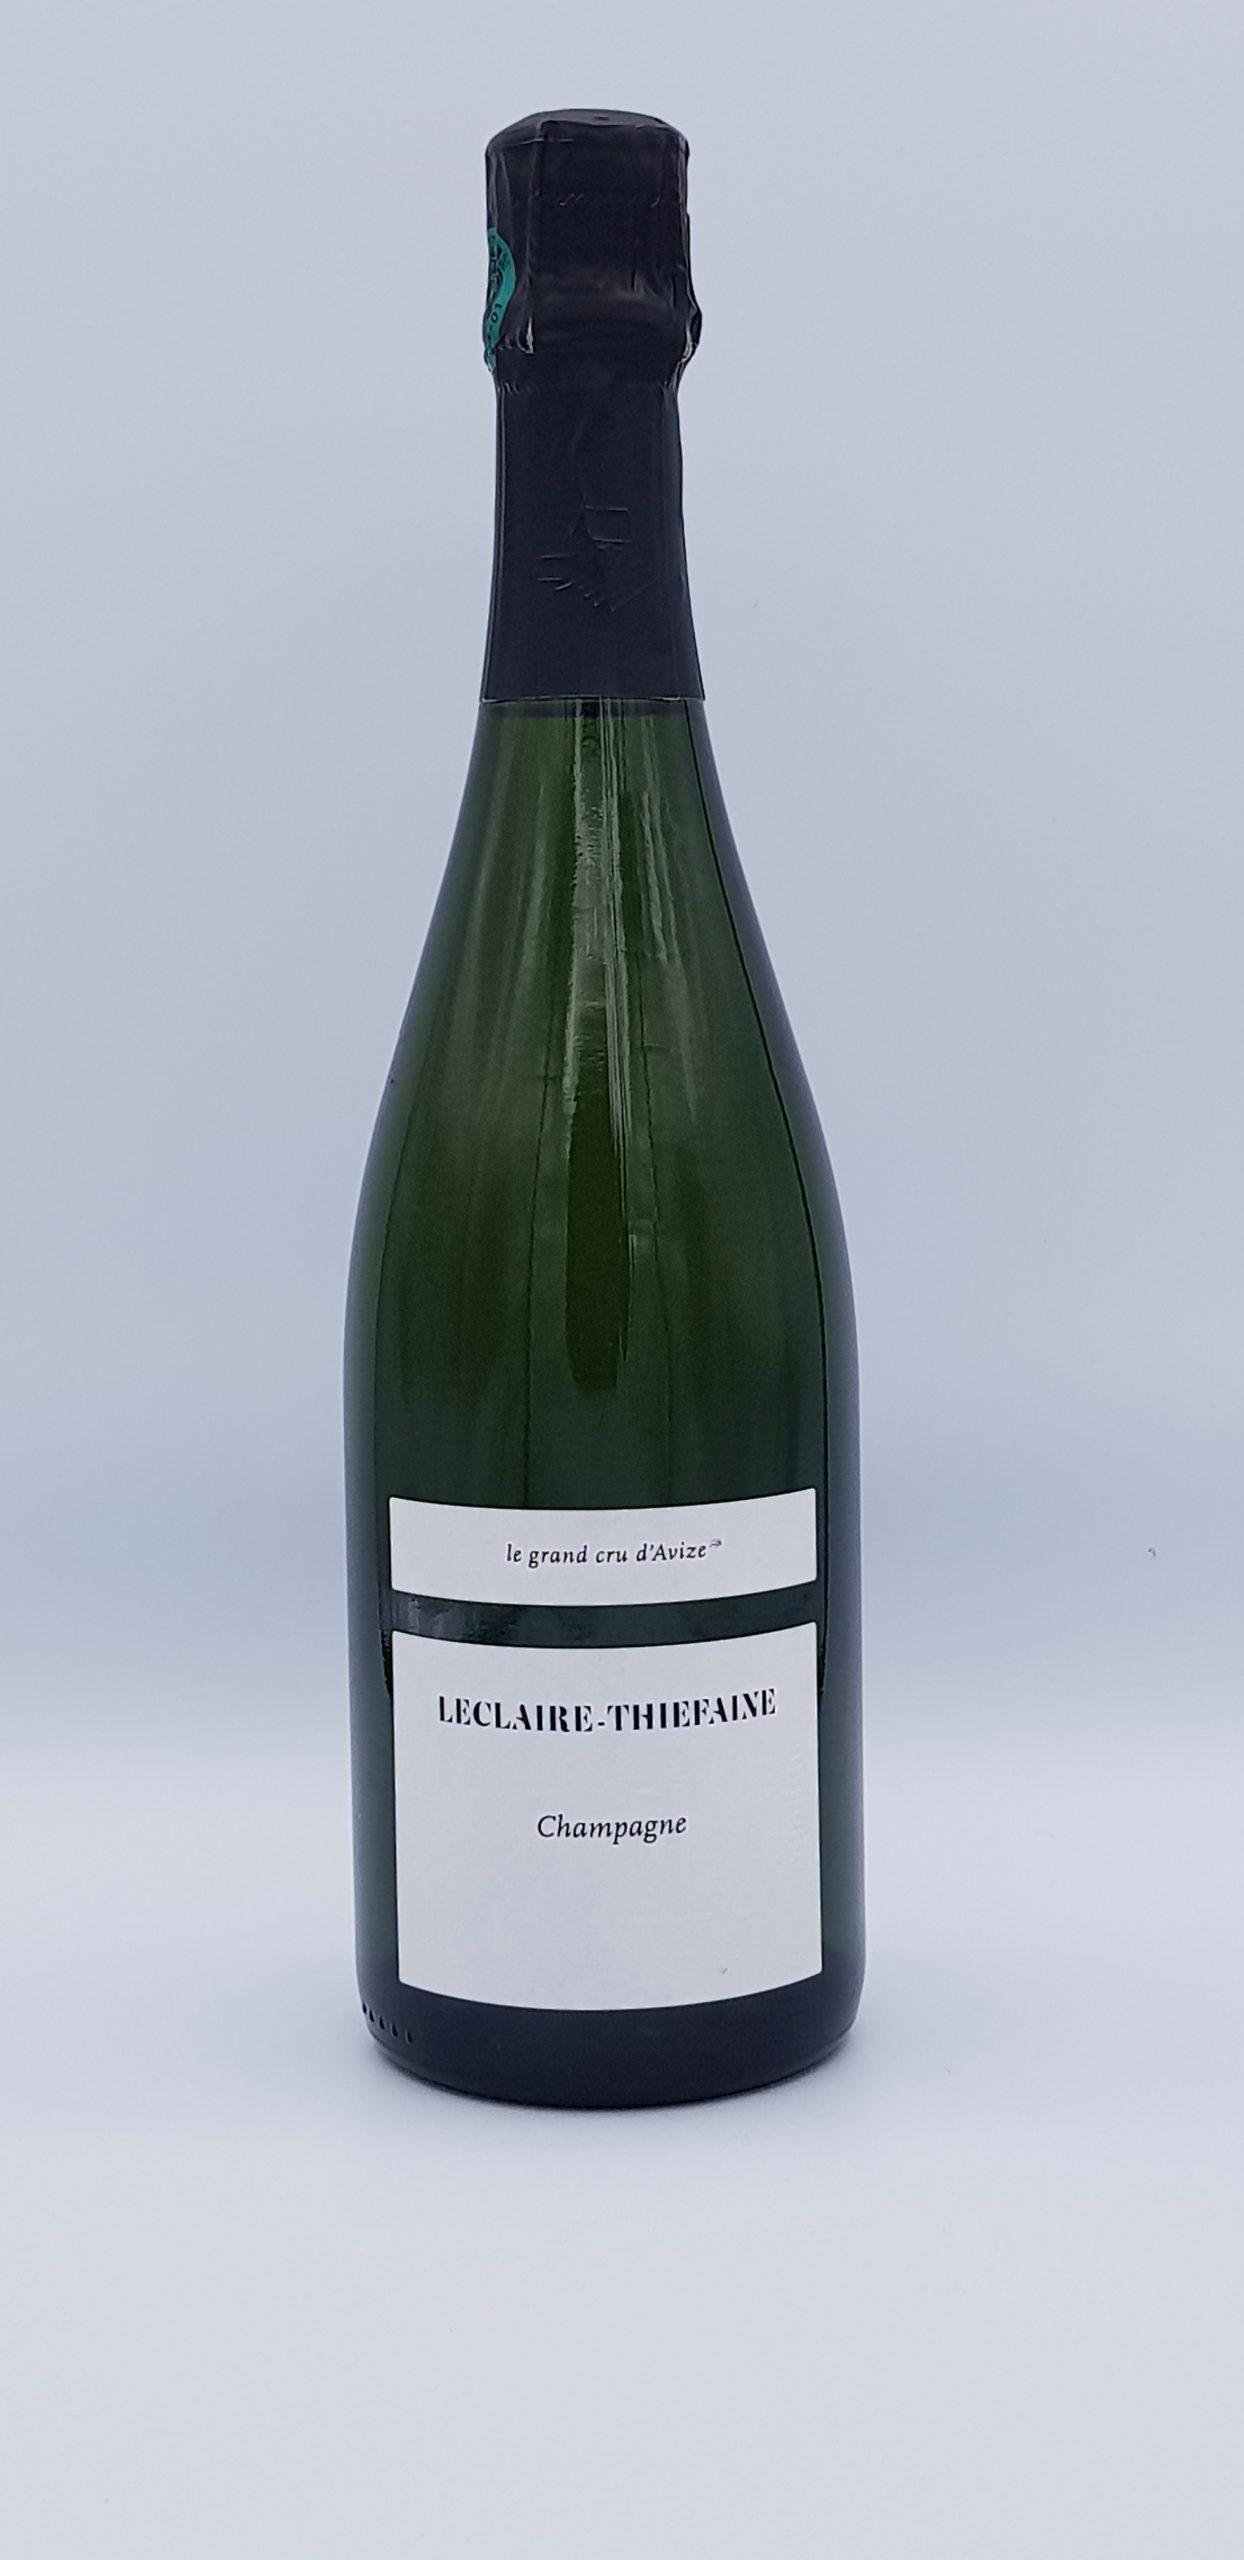 Champagne Leclaire Thiephaine Cuvee Apolline 01